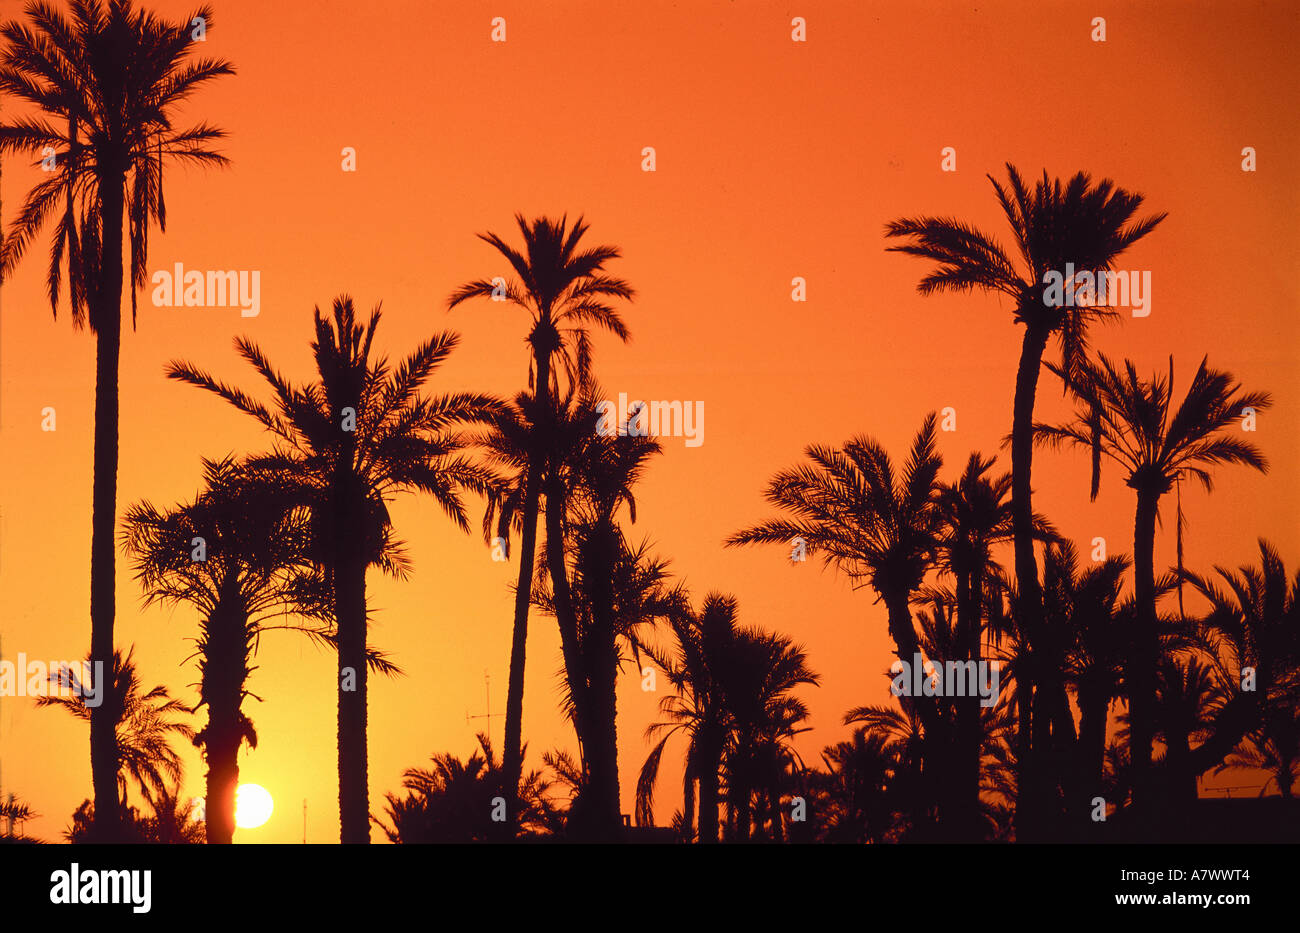 Morrocco, Marrakech, palm trees - Stock Image